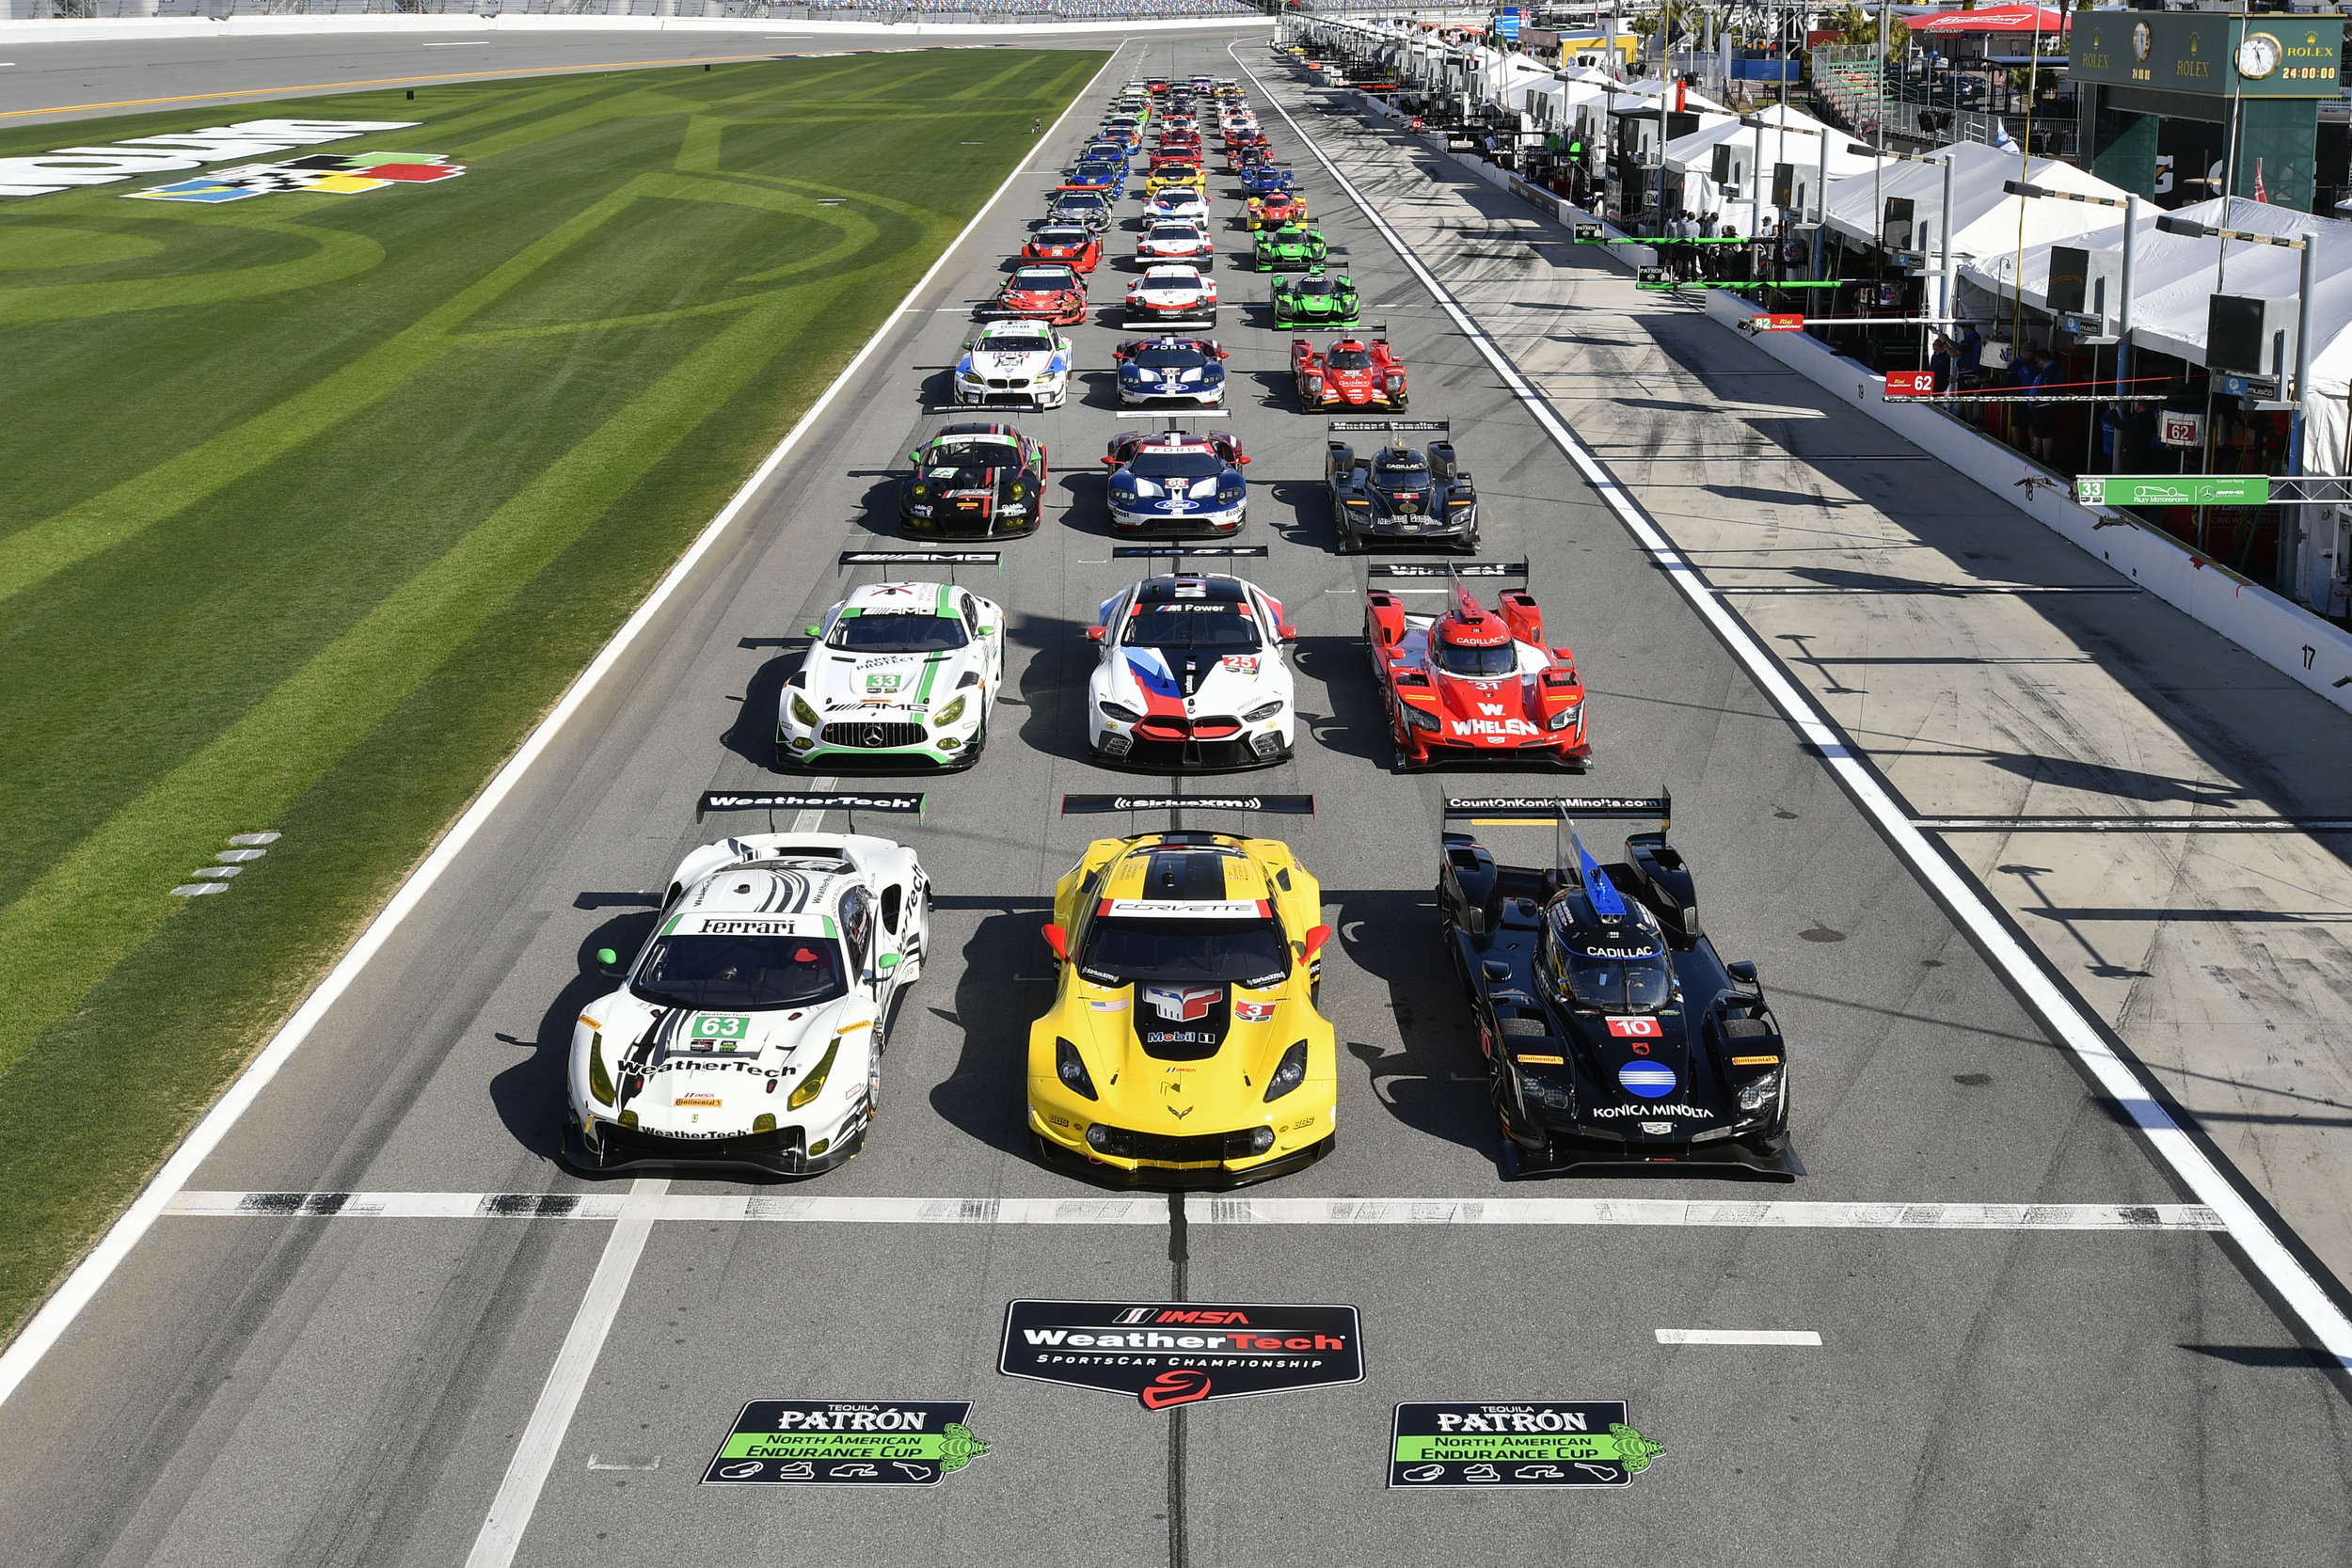 Photos courtesy of IMSA® a registered trademark of International Motor Sports Association, LLC.